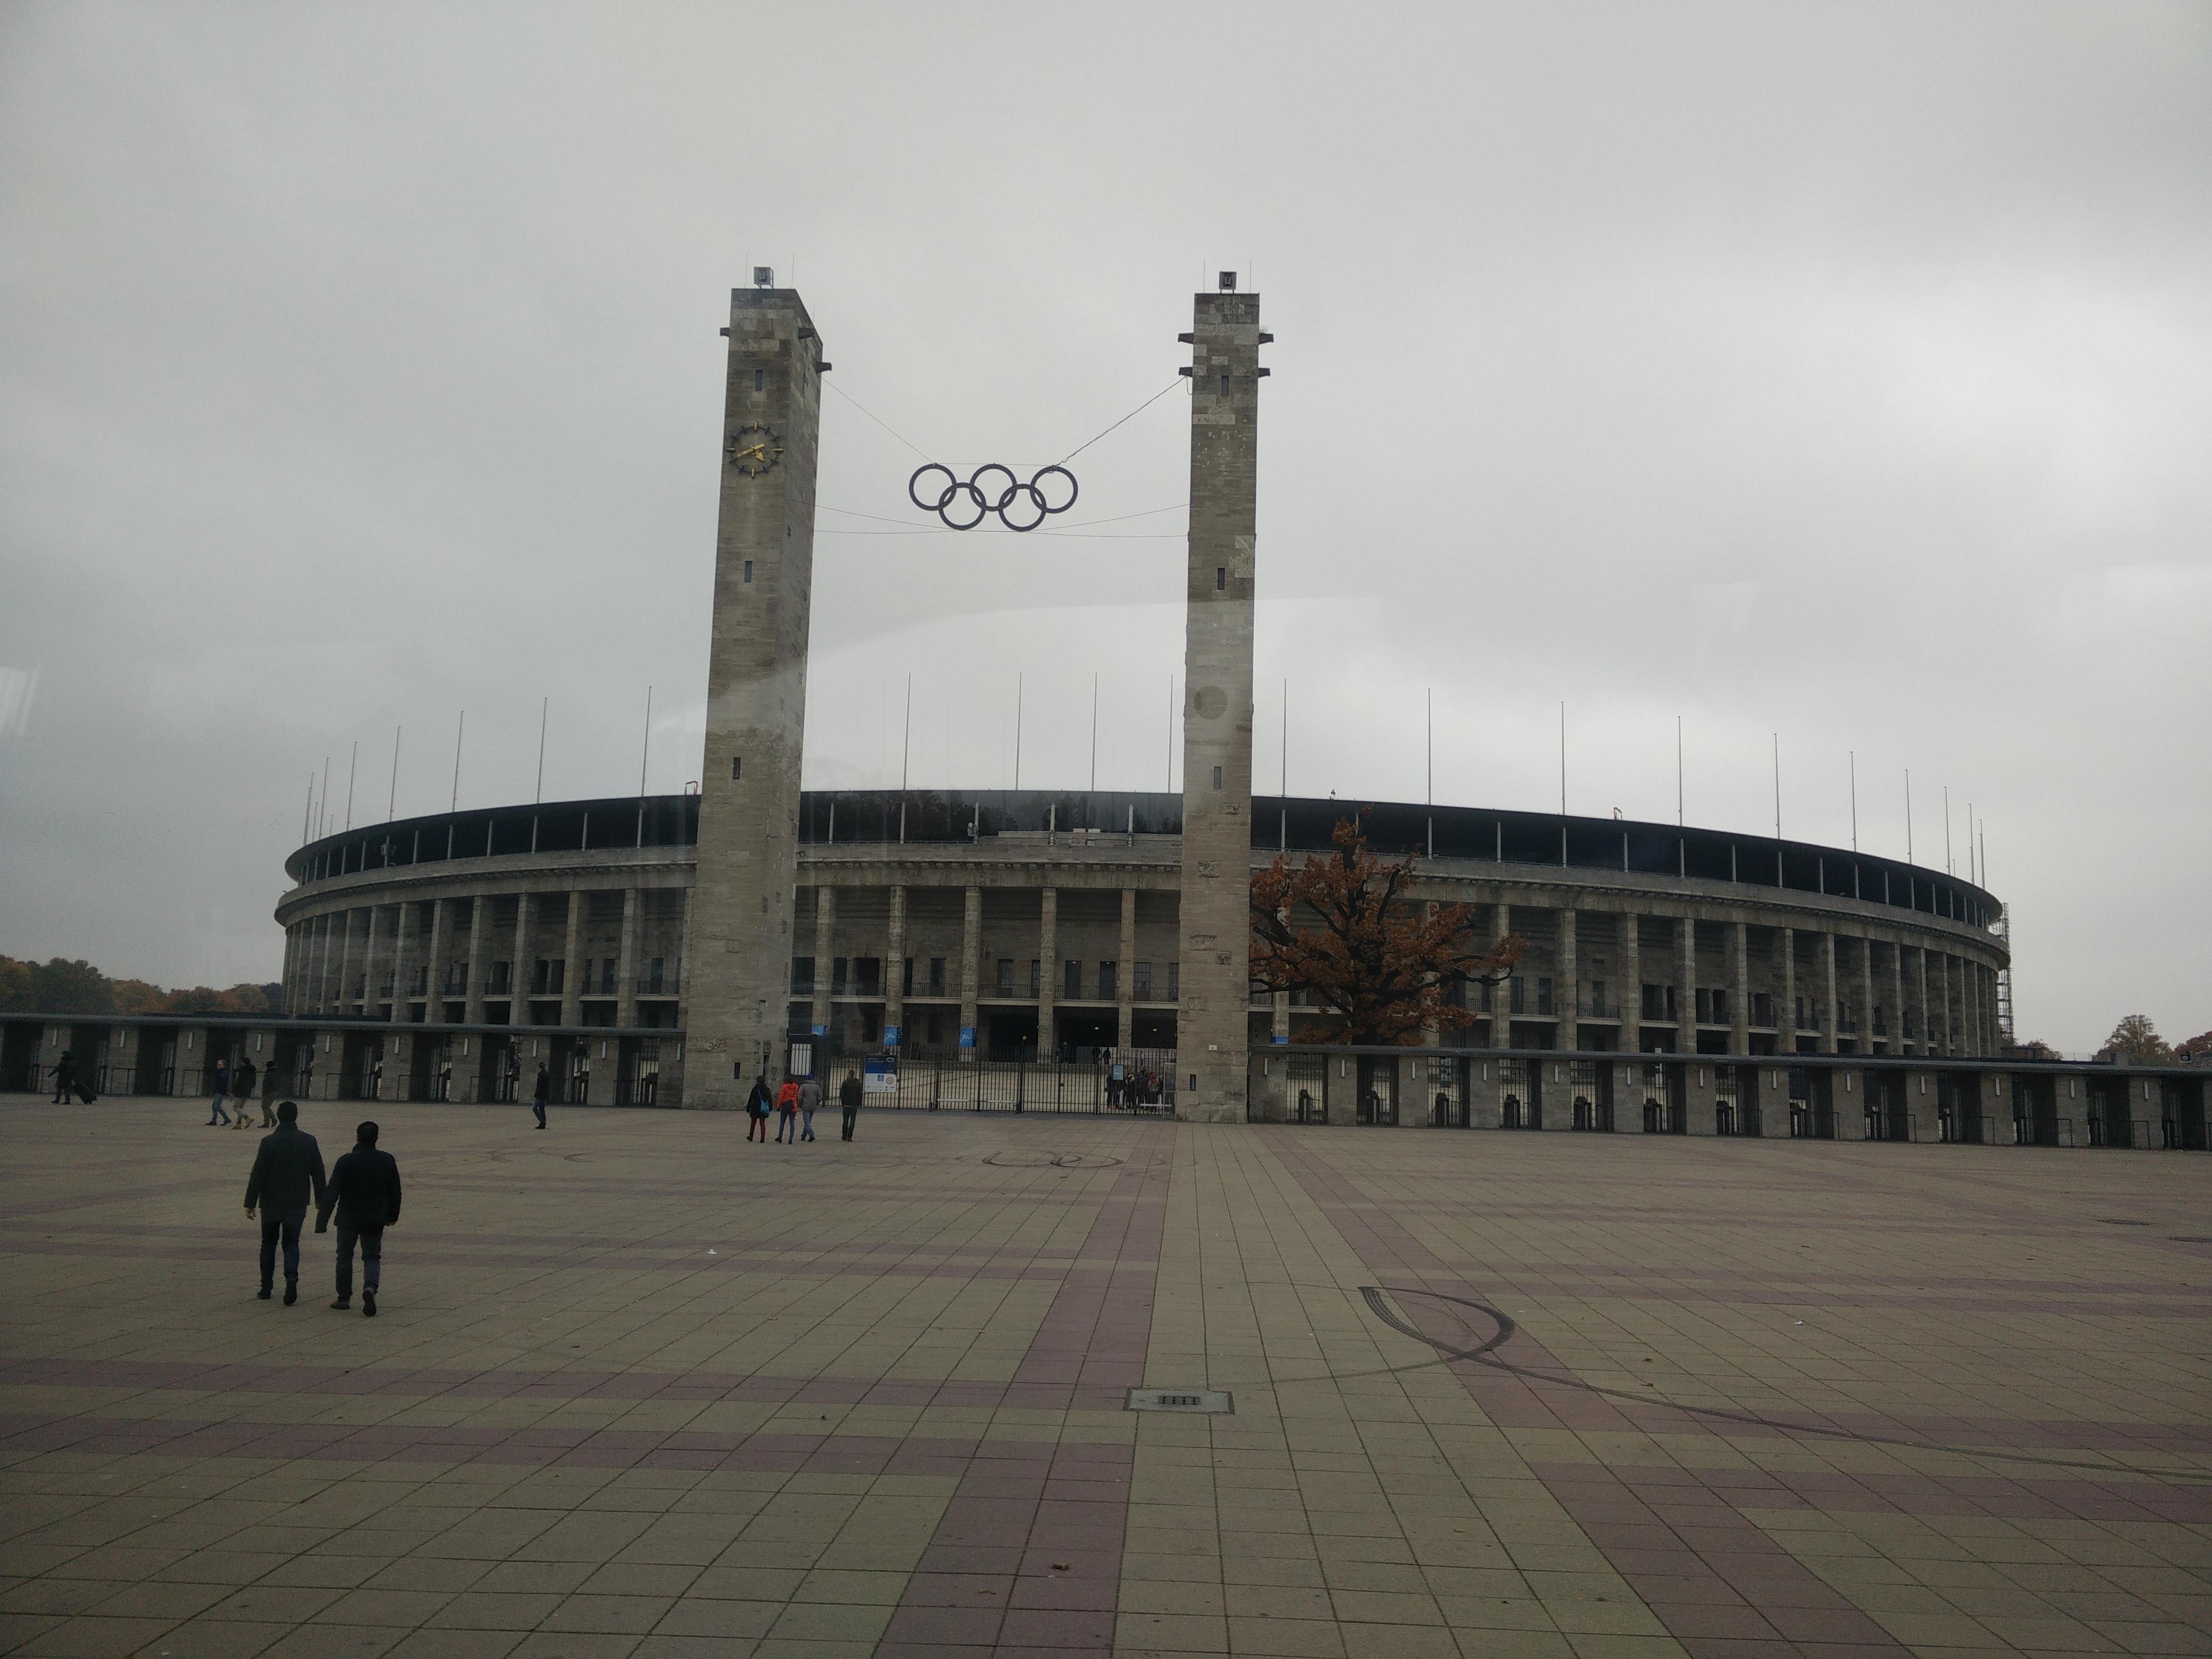 euro-ix Berlin forum